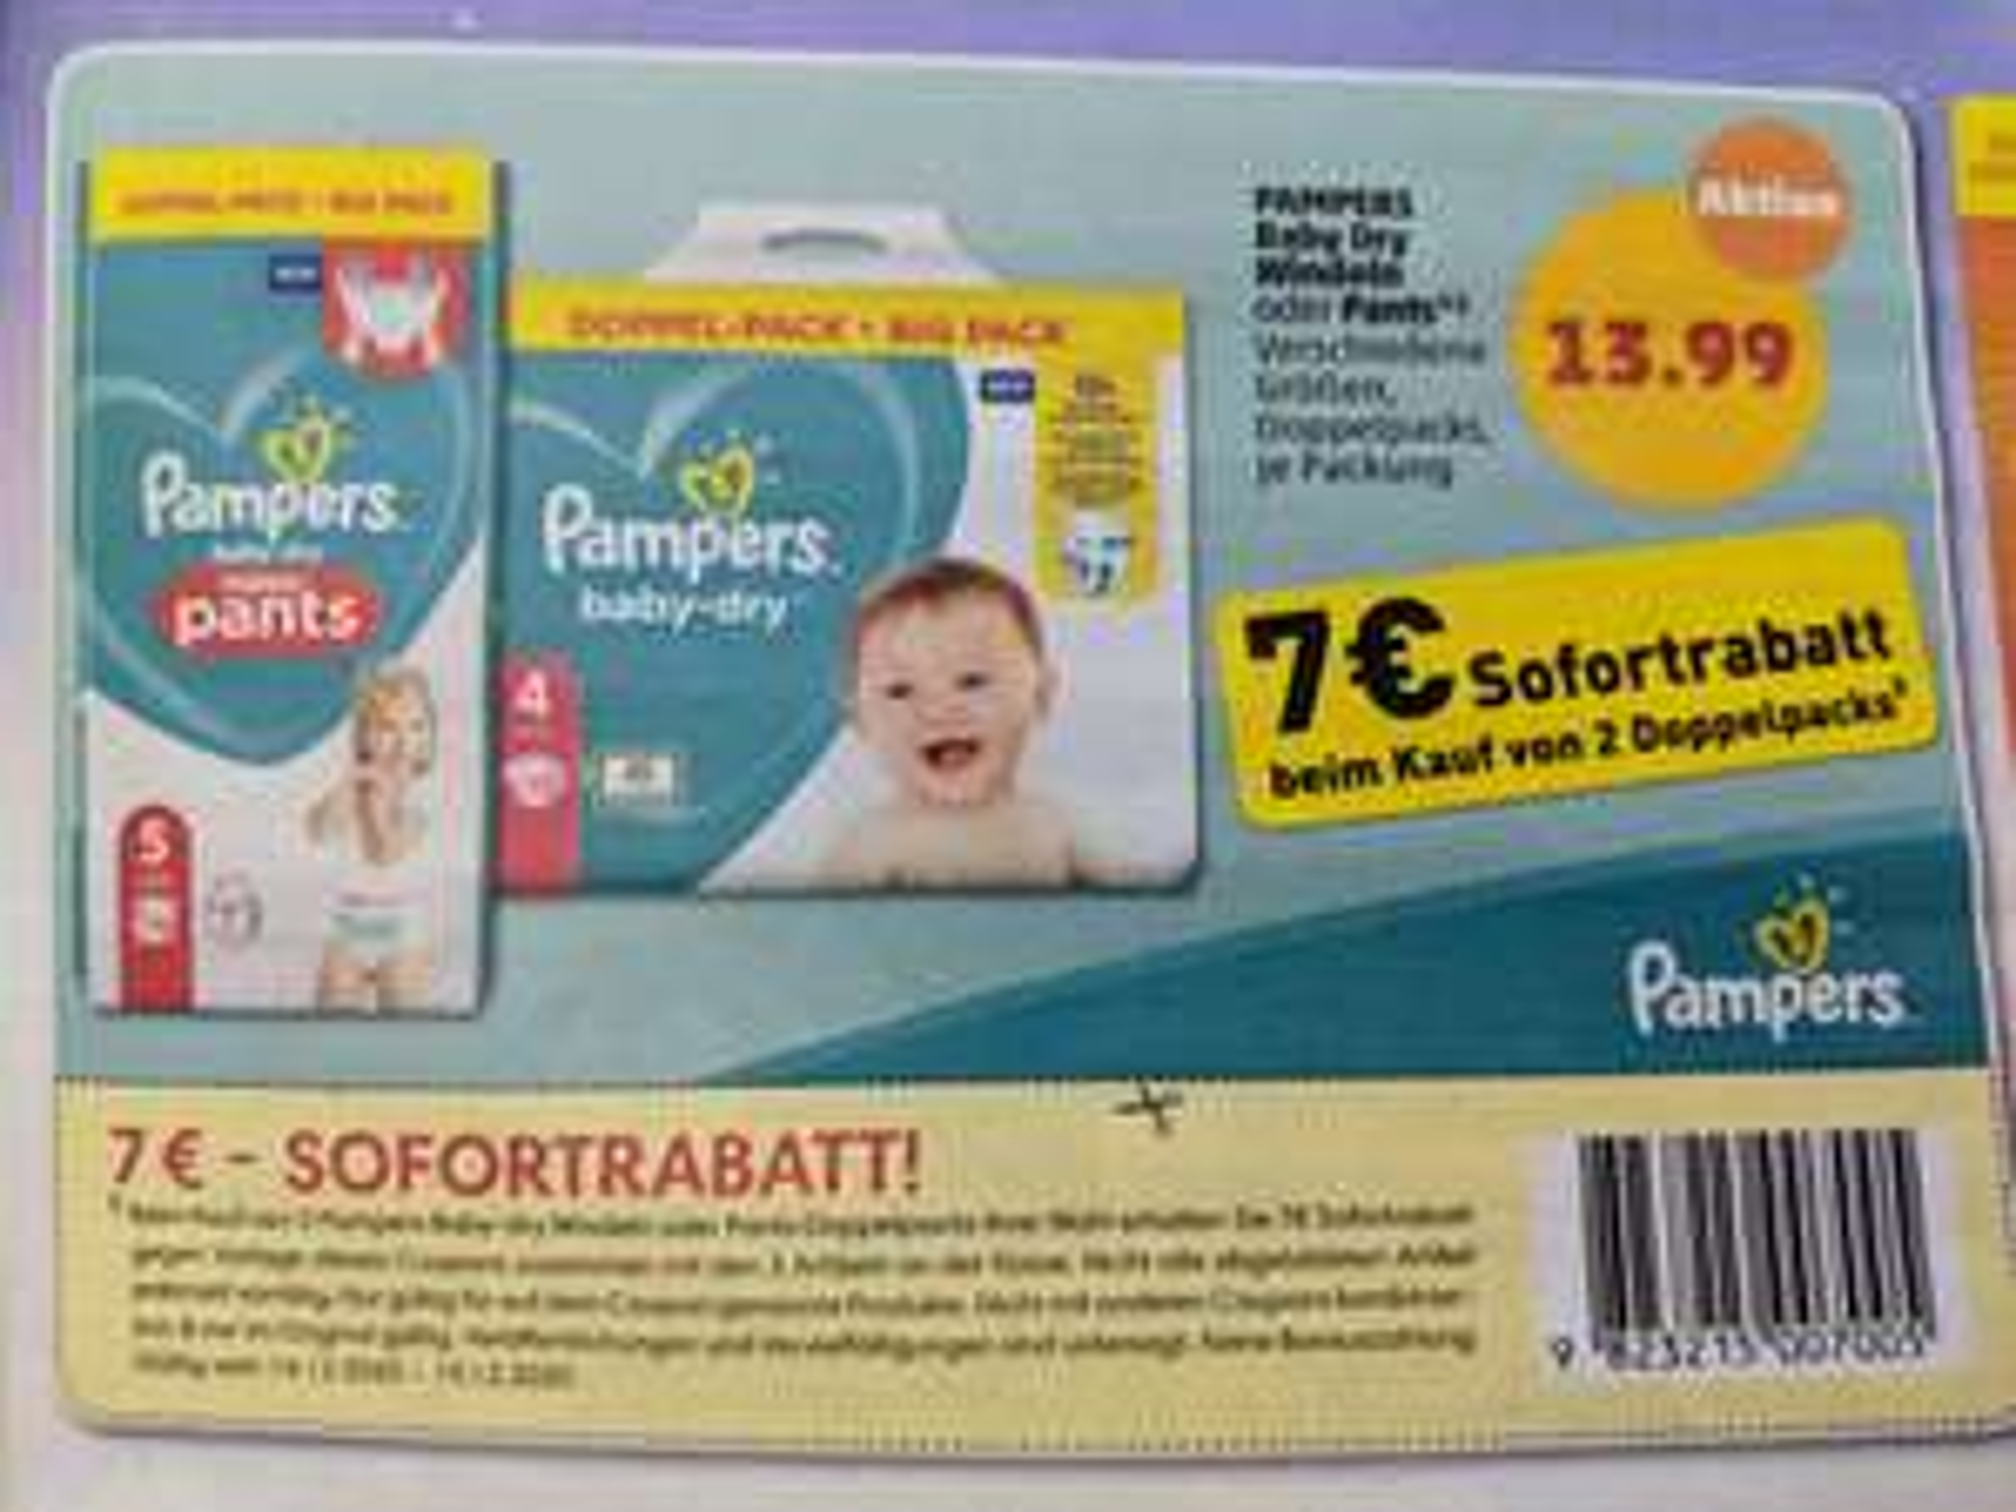 2 * PAMPERS Baby-Dry Windeln oder Pants Doppelpack @ PENNY (nach 7,-€ Sofortrabatt)